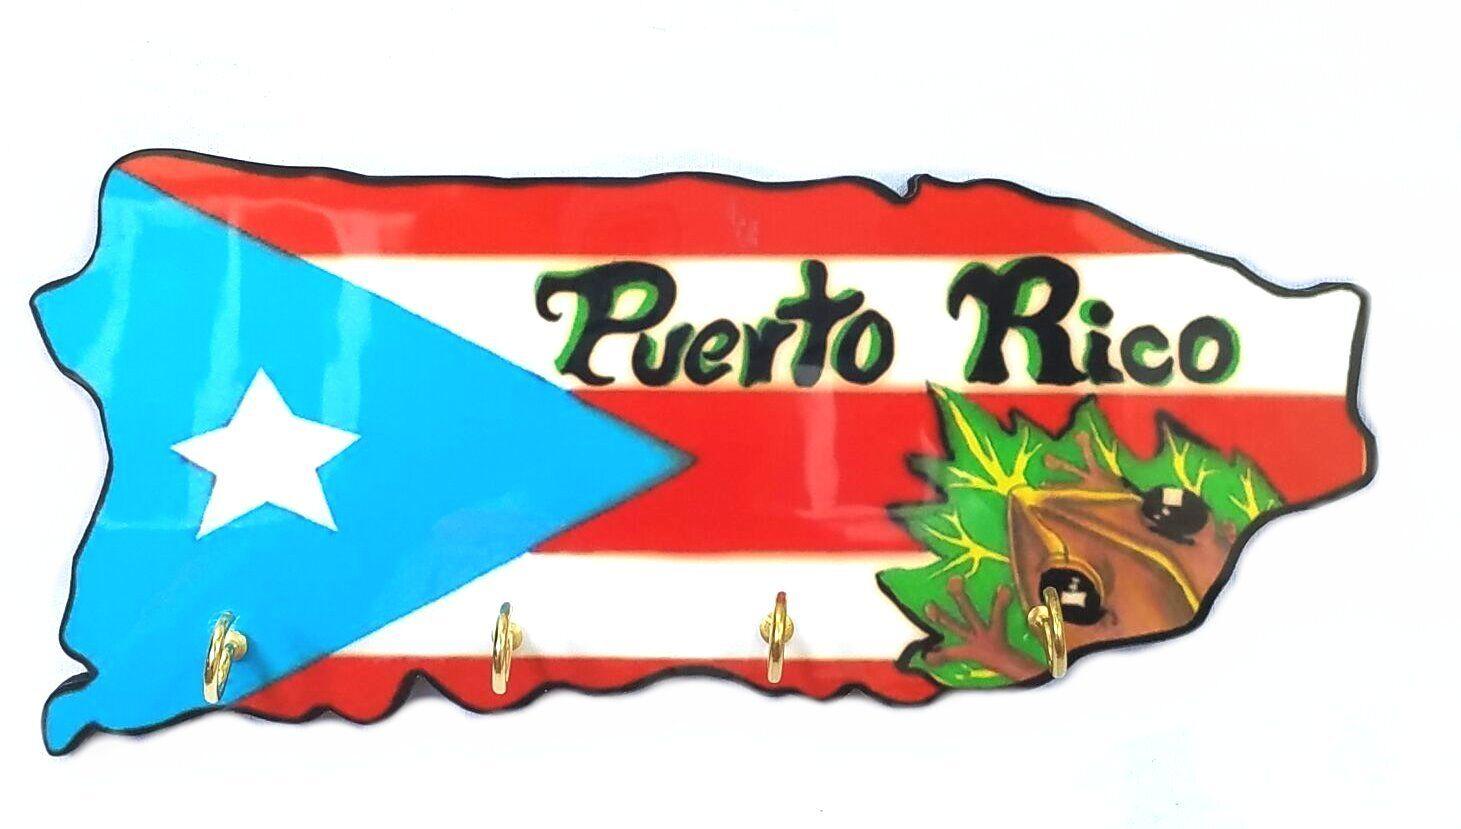 Boricua  Rican #3 Puerto Rico Home Decorative Souvenirs Keychain Wall Holder